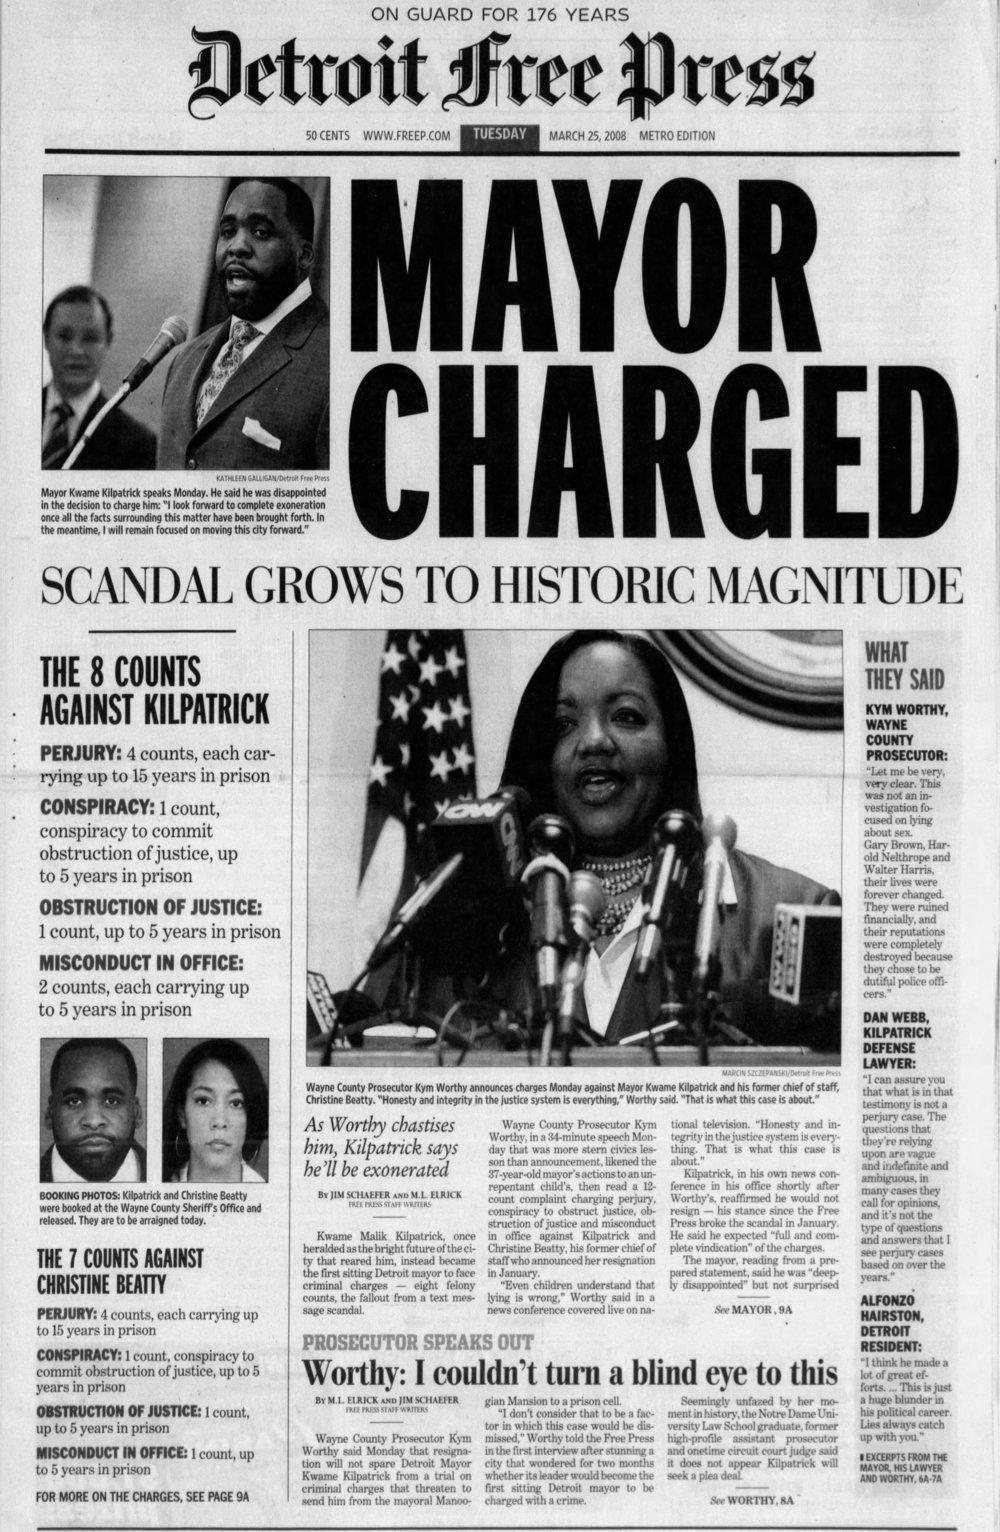 Detroit_Free_Press_Tue__Mar_25__2008_.jpg